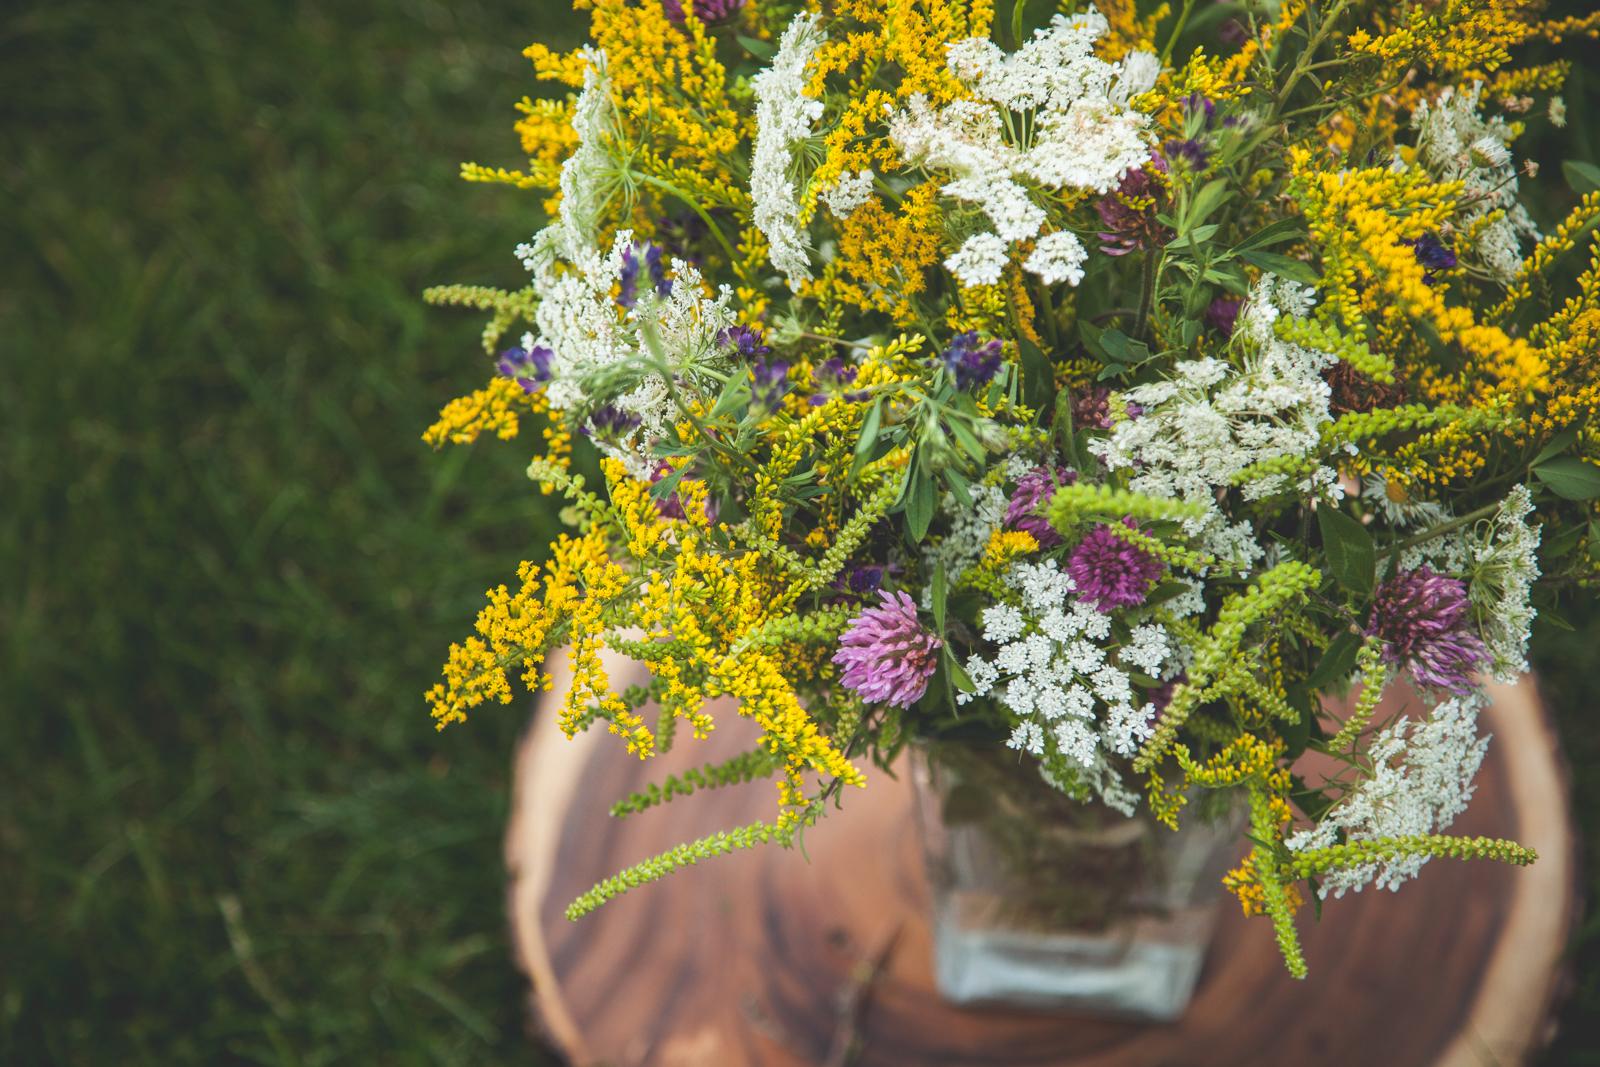 WildflowersPart2-sm-0541.jpg